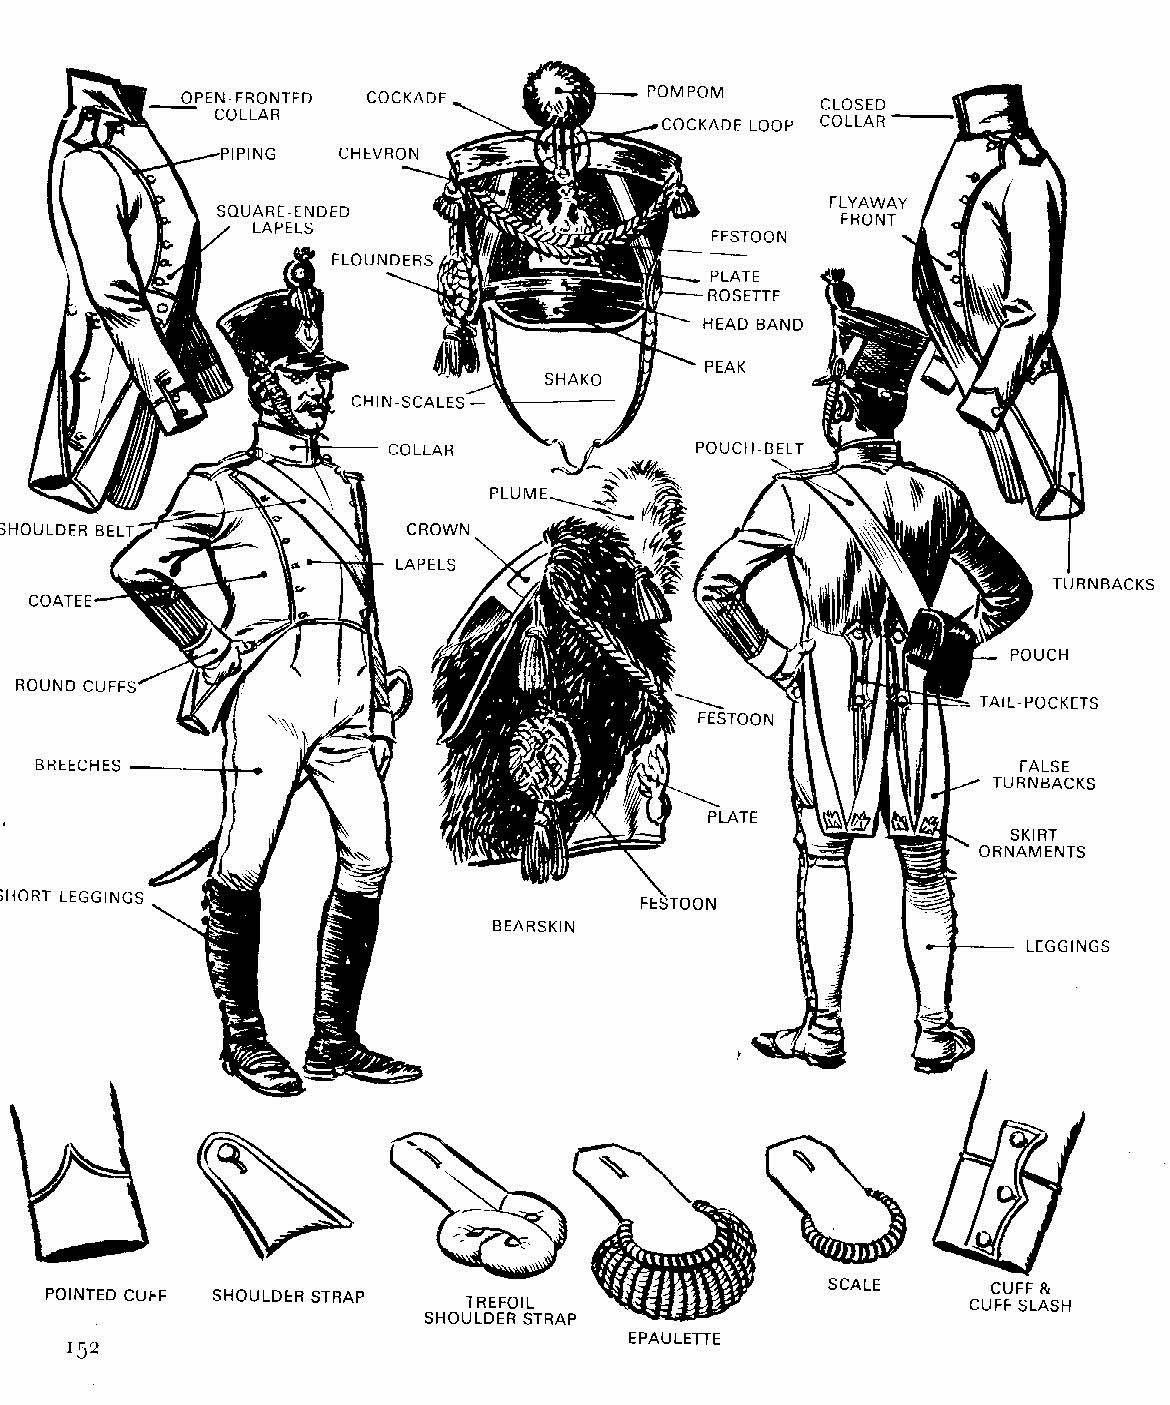 Murdock S Marauders Napoleonic Intantry Uniform